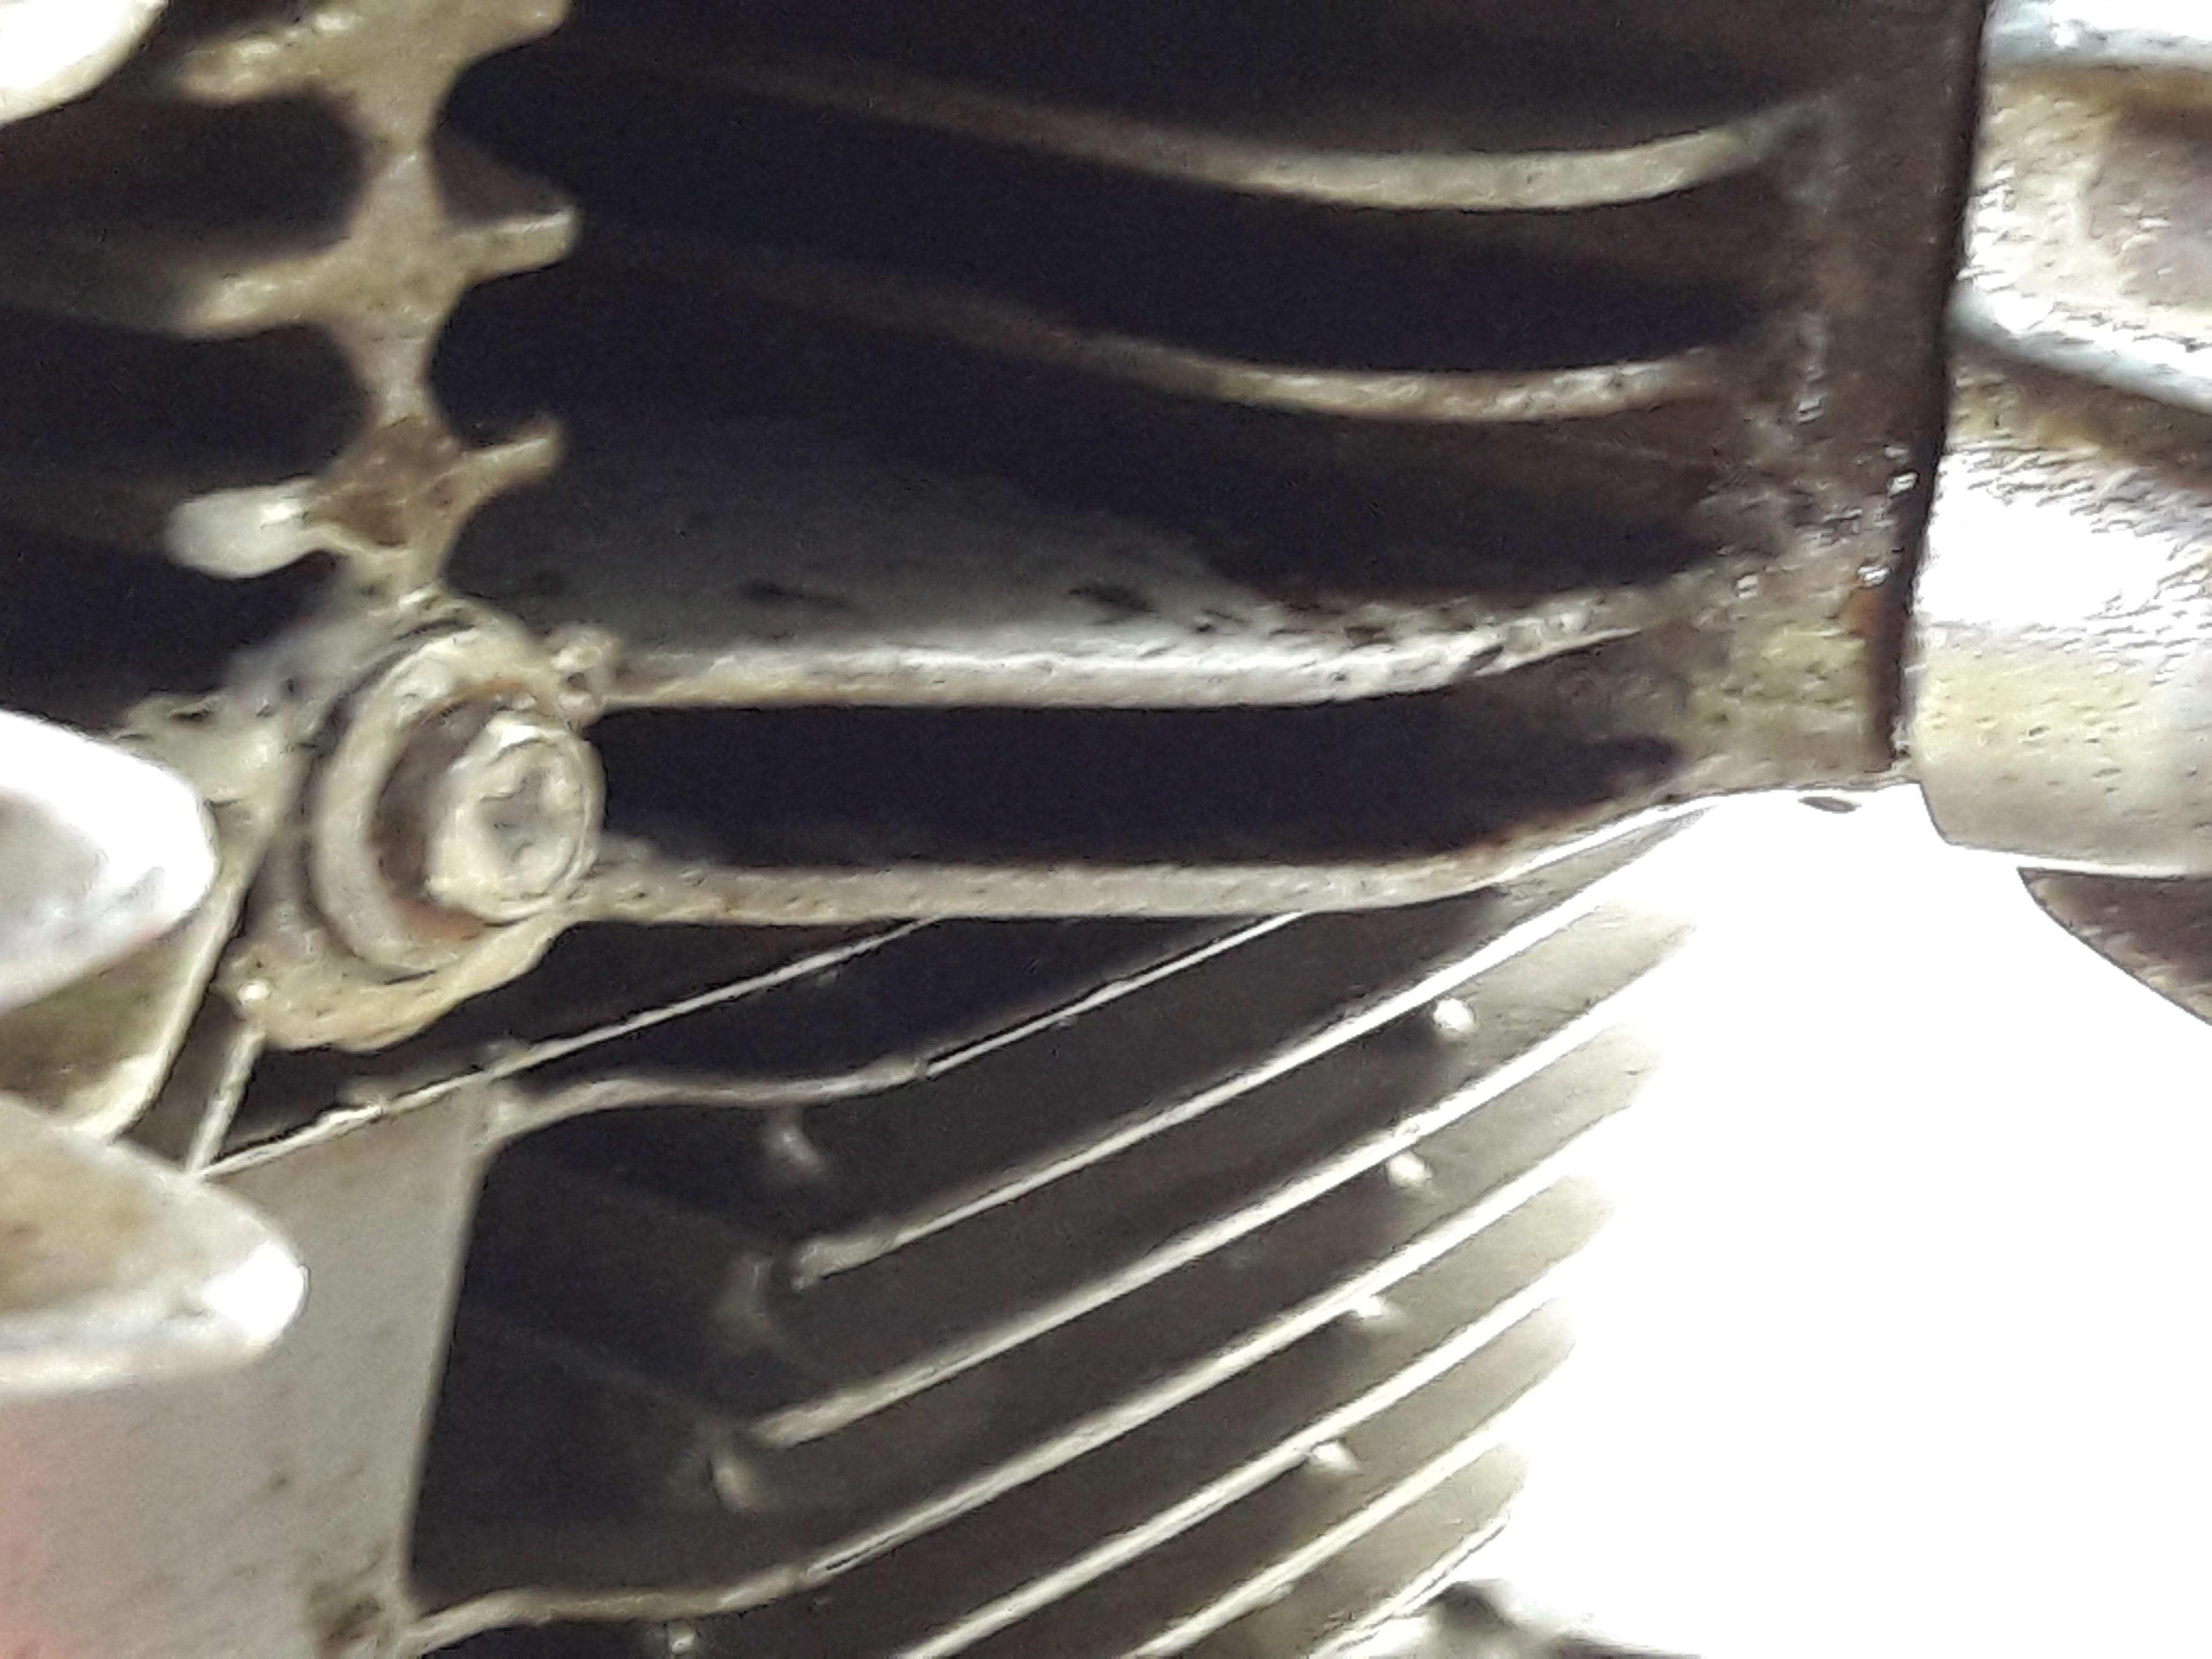 CB200 Cam Chain adjustment bolt misplaced!?-cb200-head-front-side.jpg